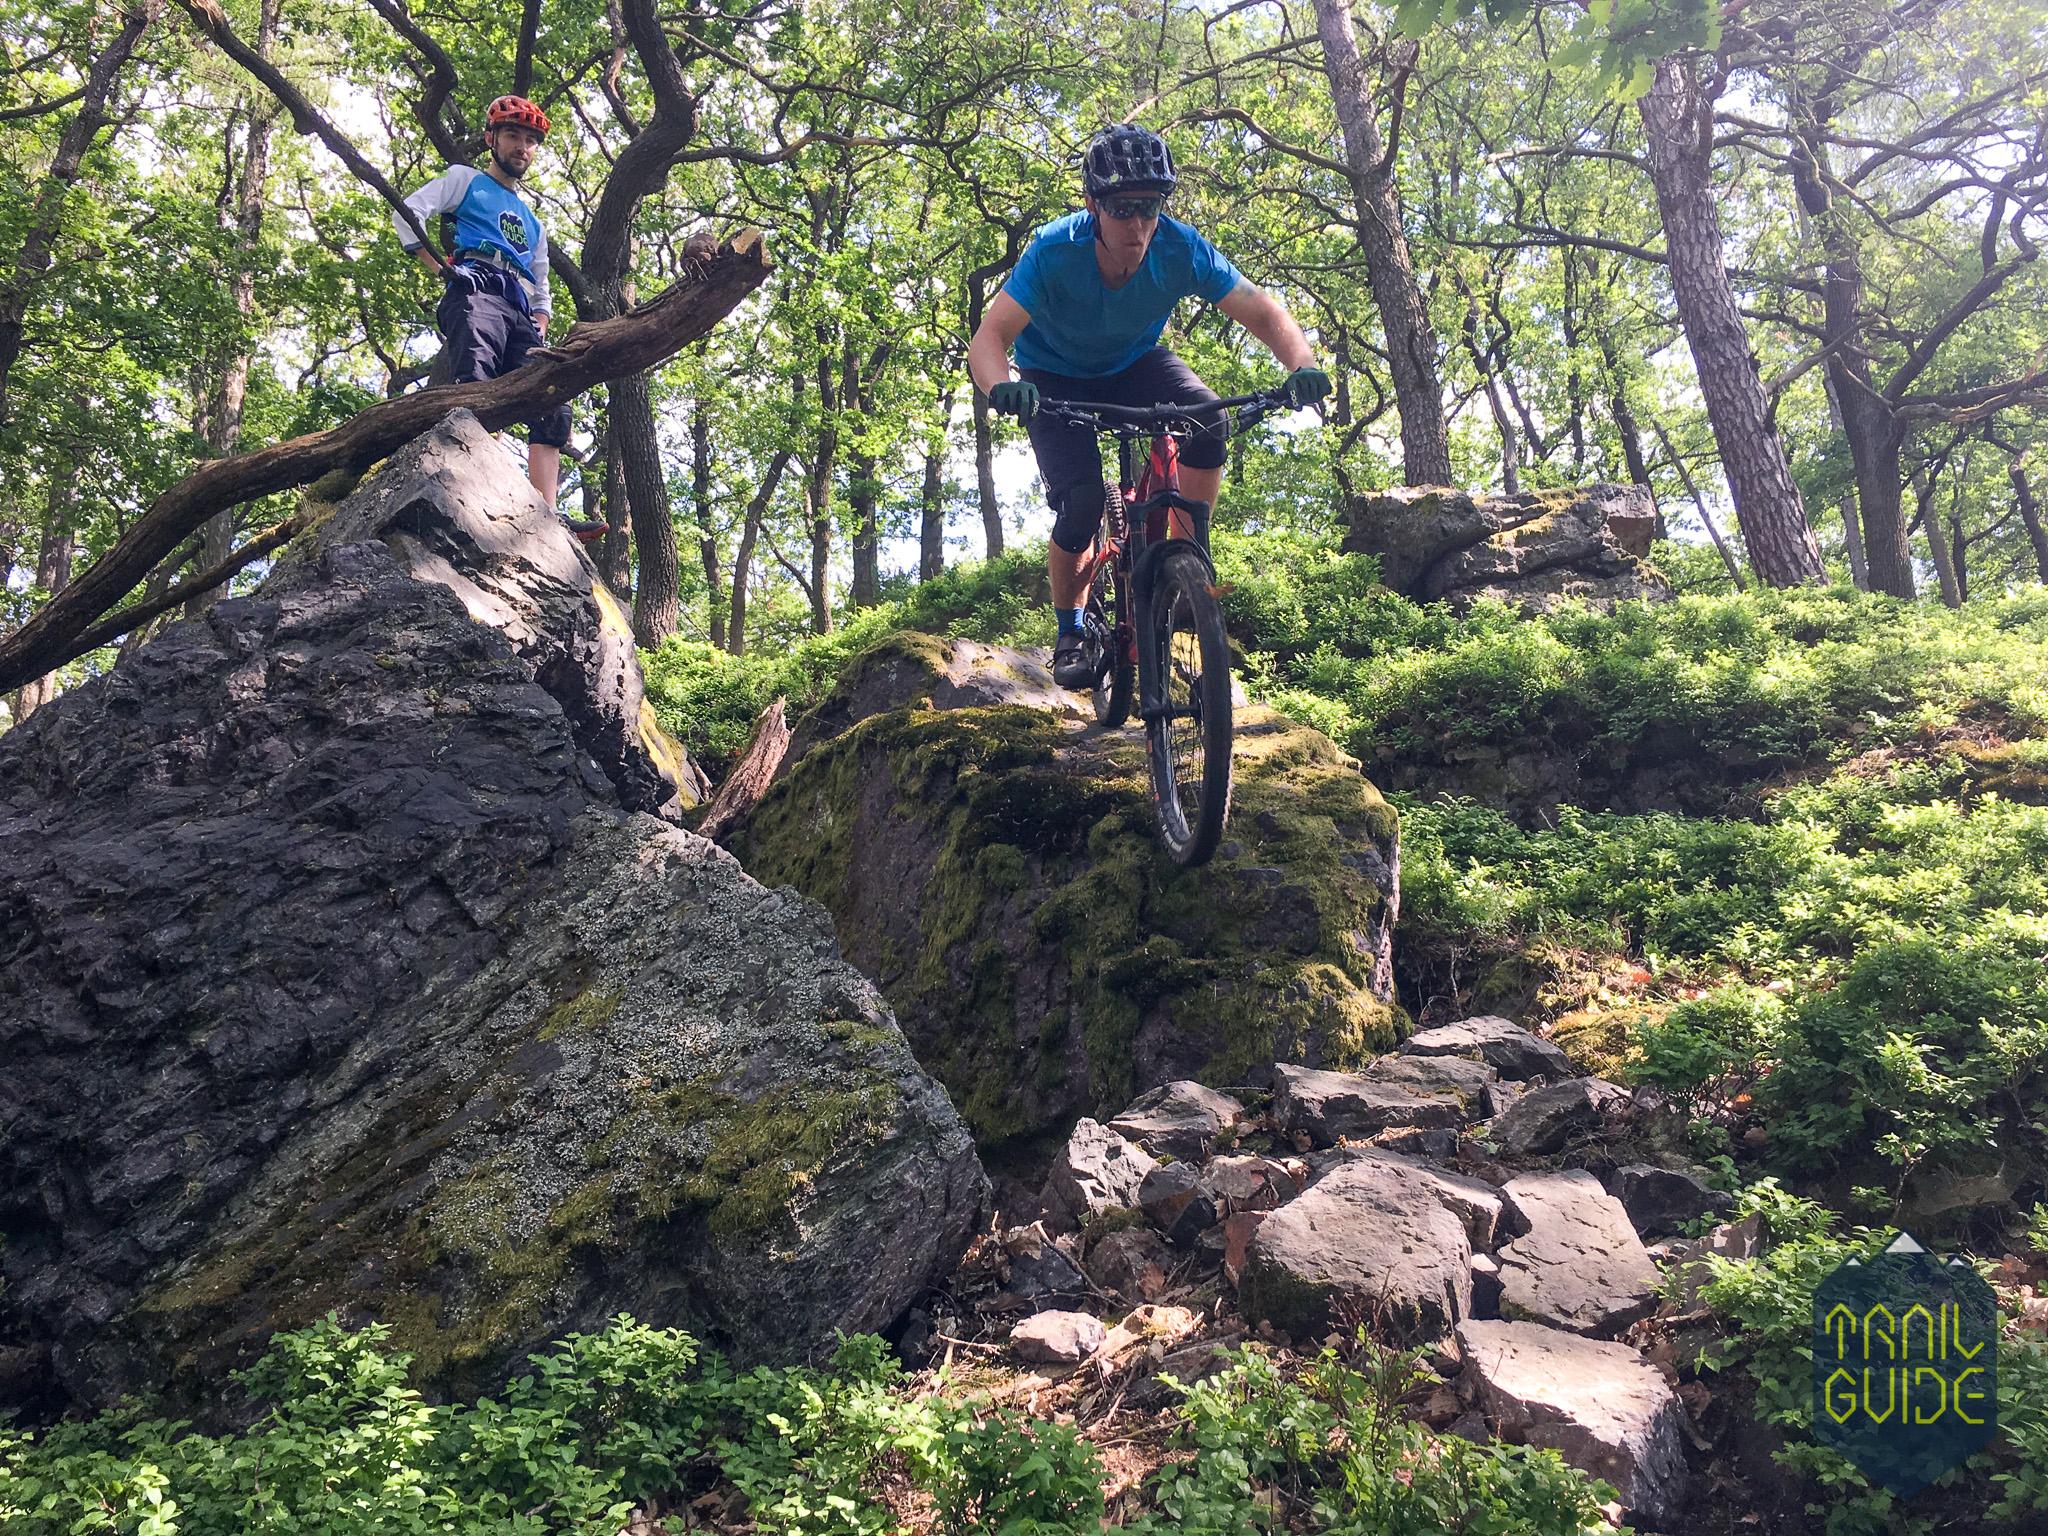 MTB-vyjizdka-allmountain-enduro-trail-guide-2_d7ue2t.jpg